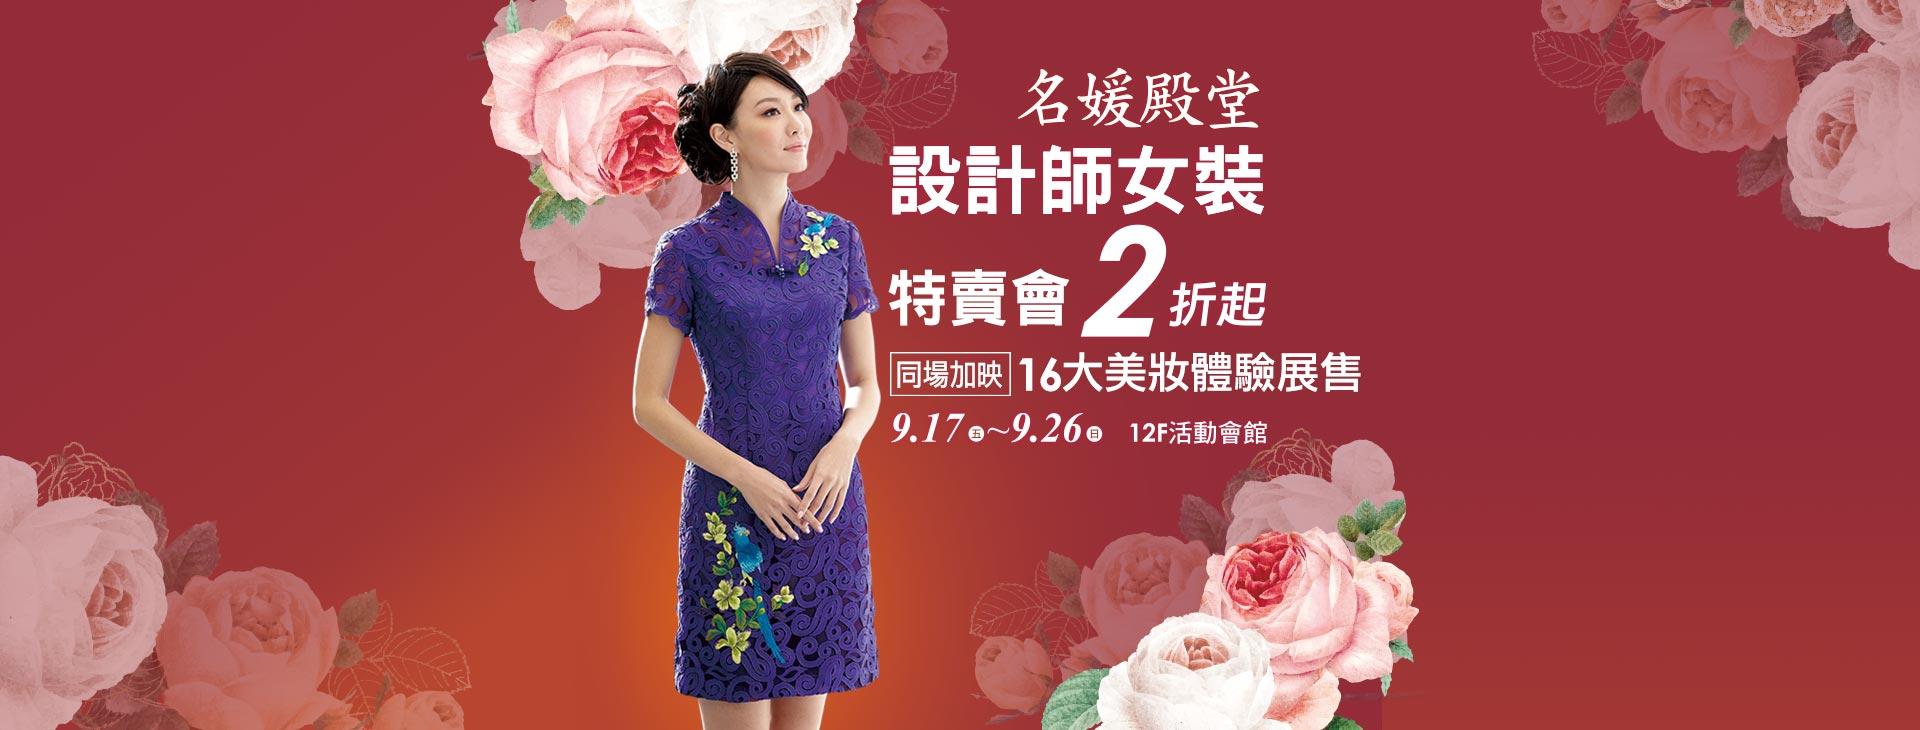 12F活動會館「名媛殿堂 設計師女裝特賣會2折起」同場加映 16大美妝體驗展售